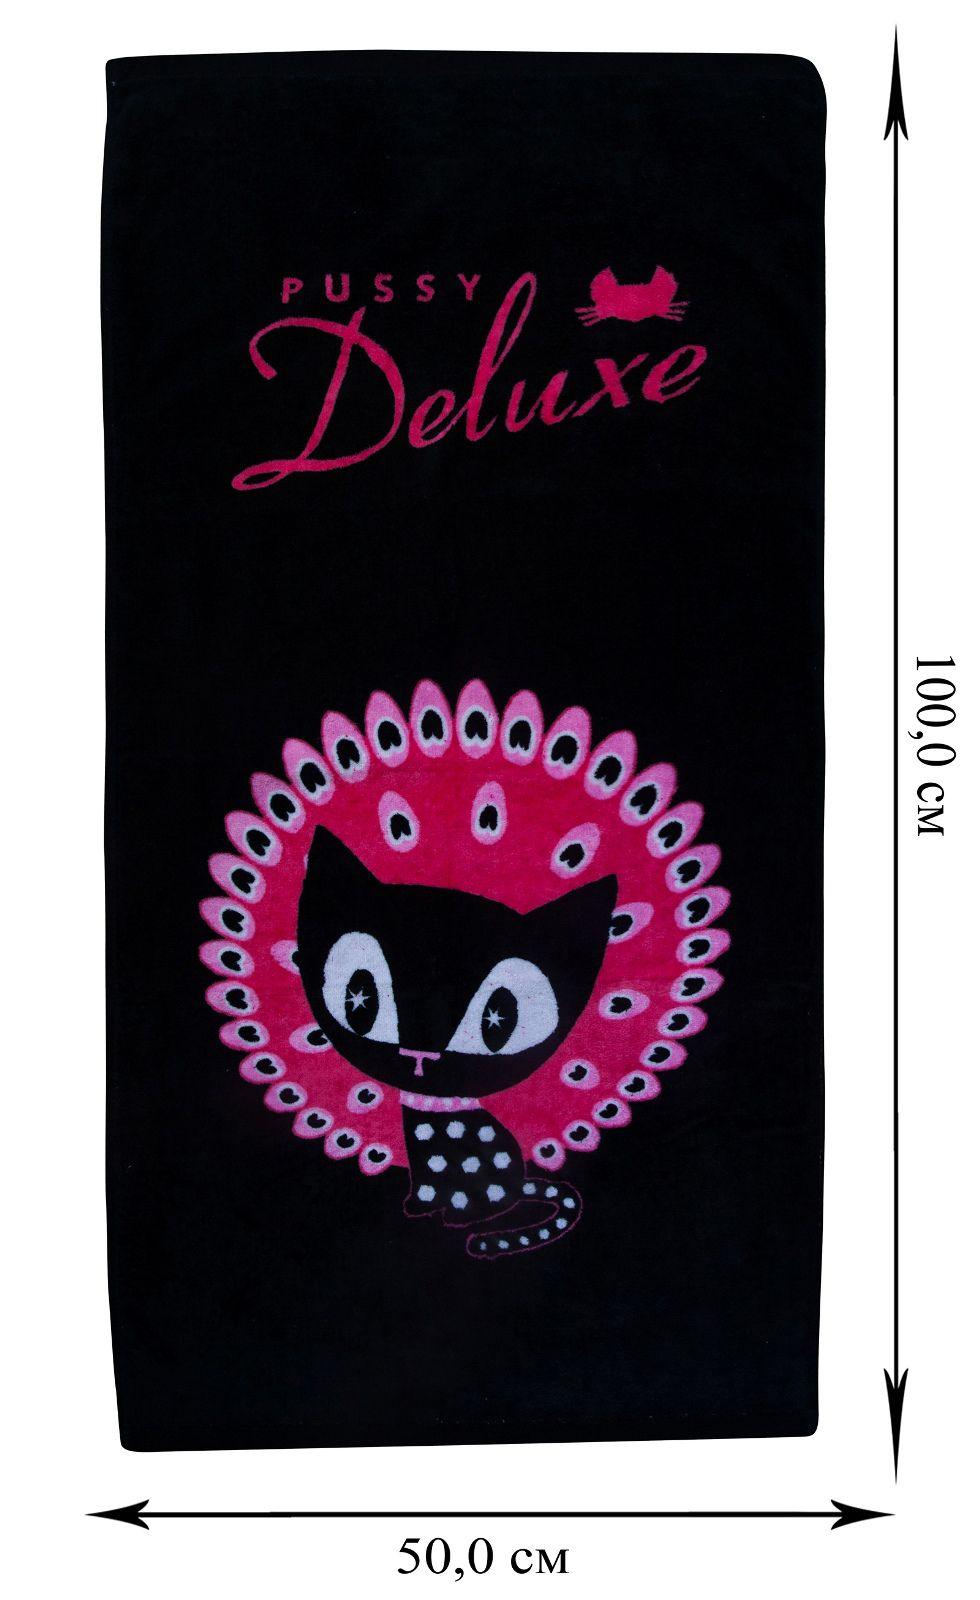 Полотенце для девушек - купить онлайн